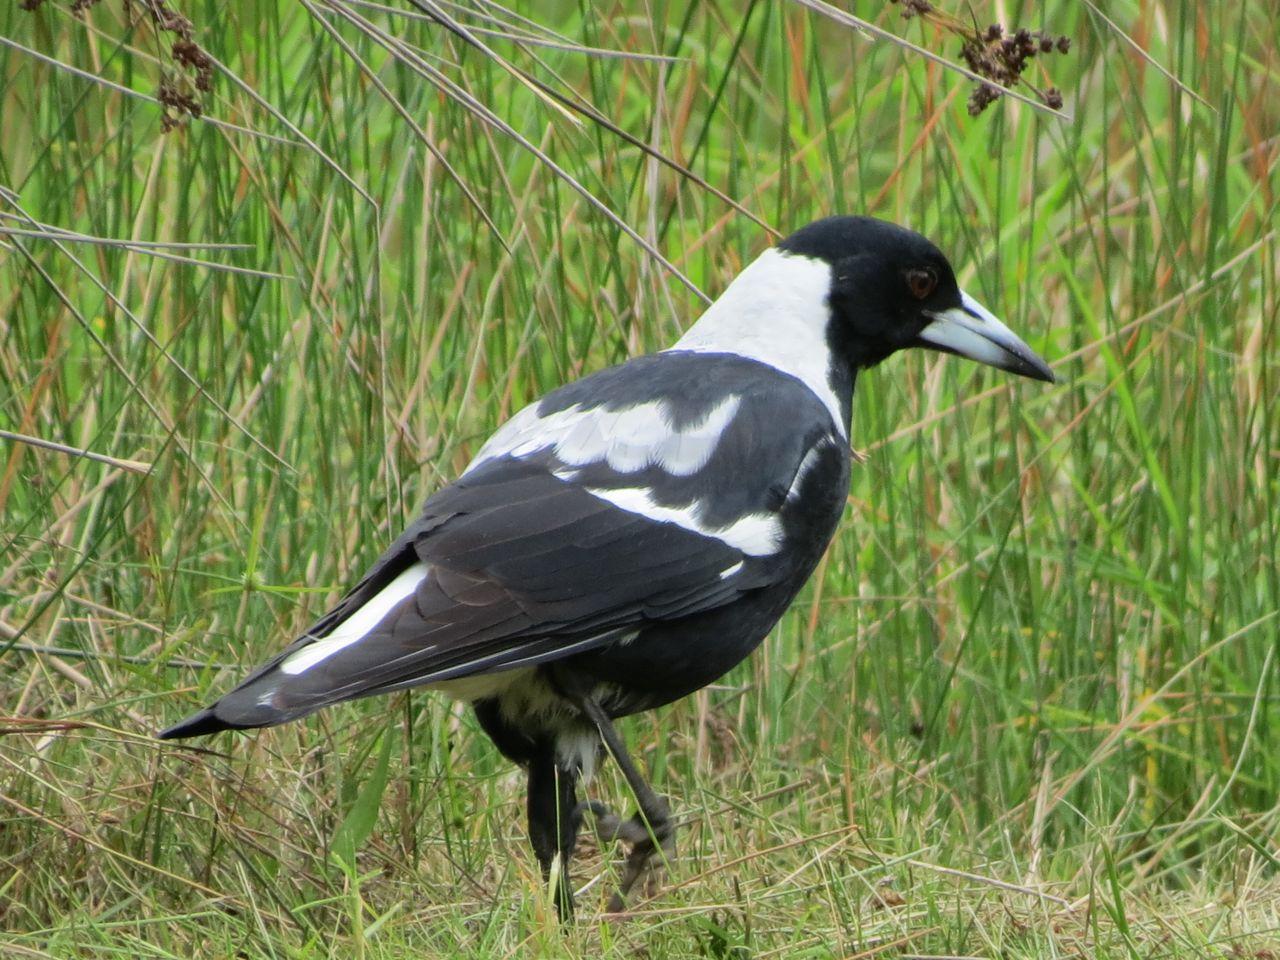 Australian Magpies | dadirridreaming - photo#7